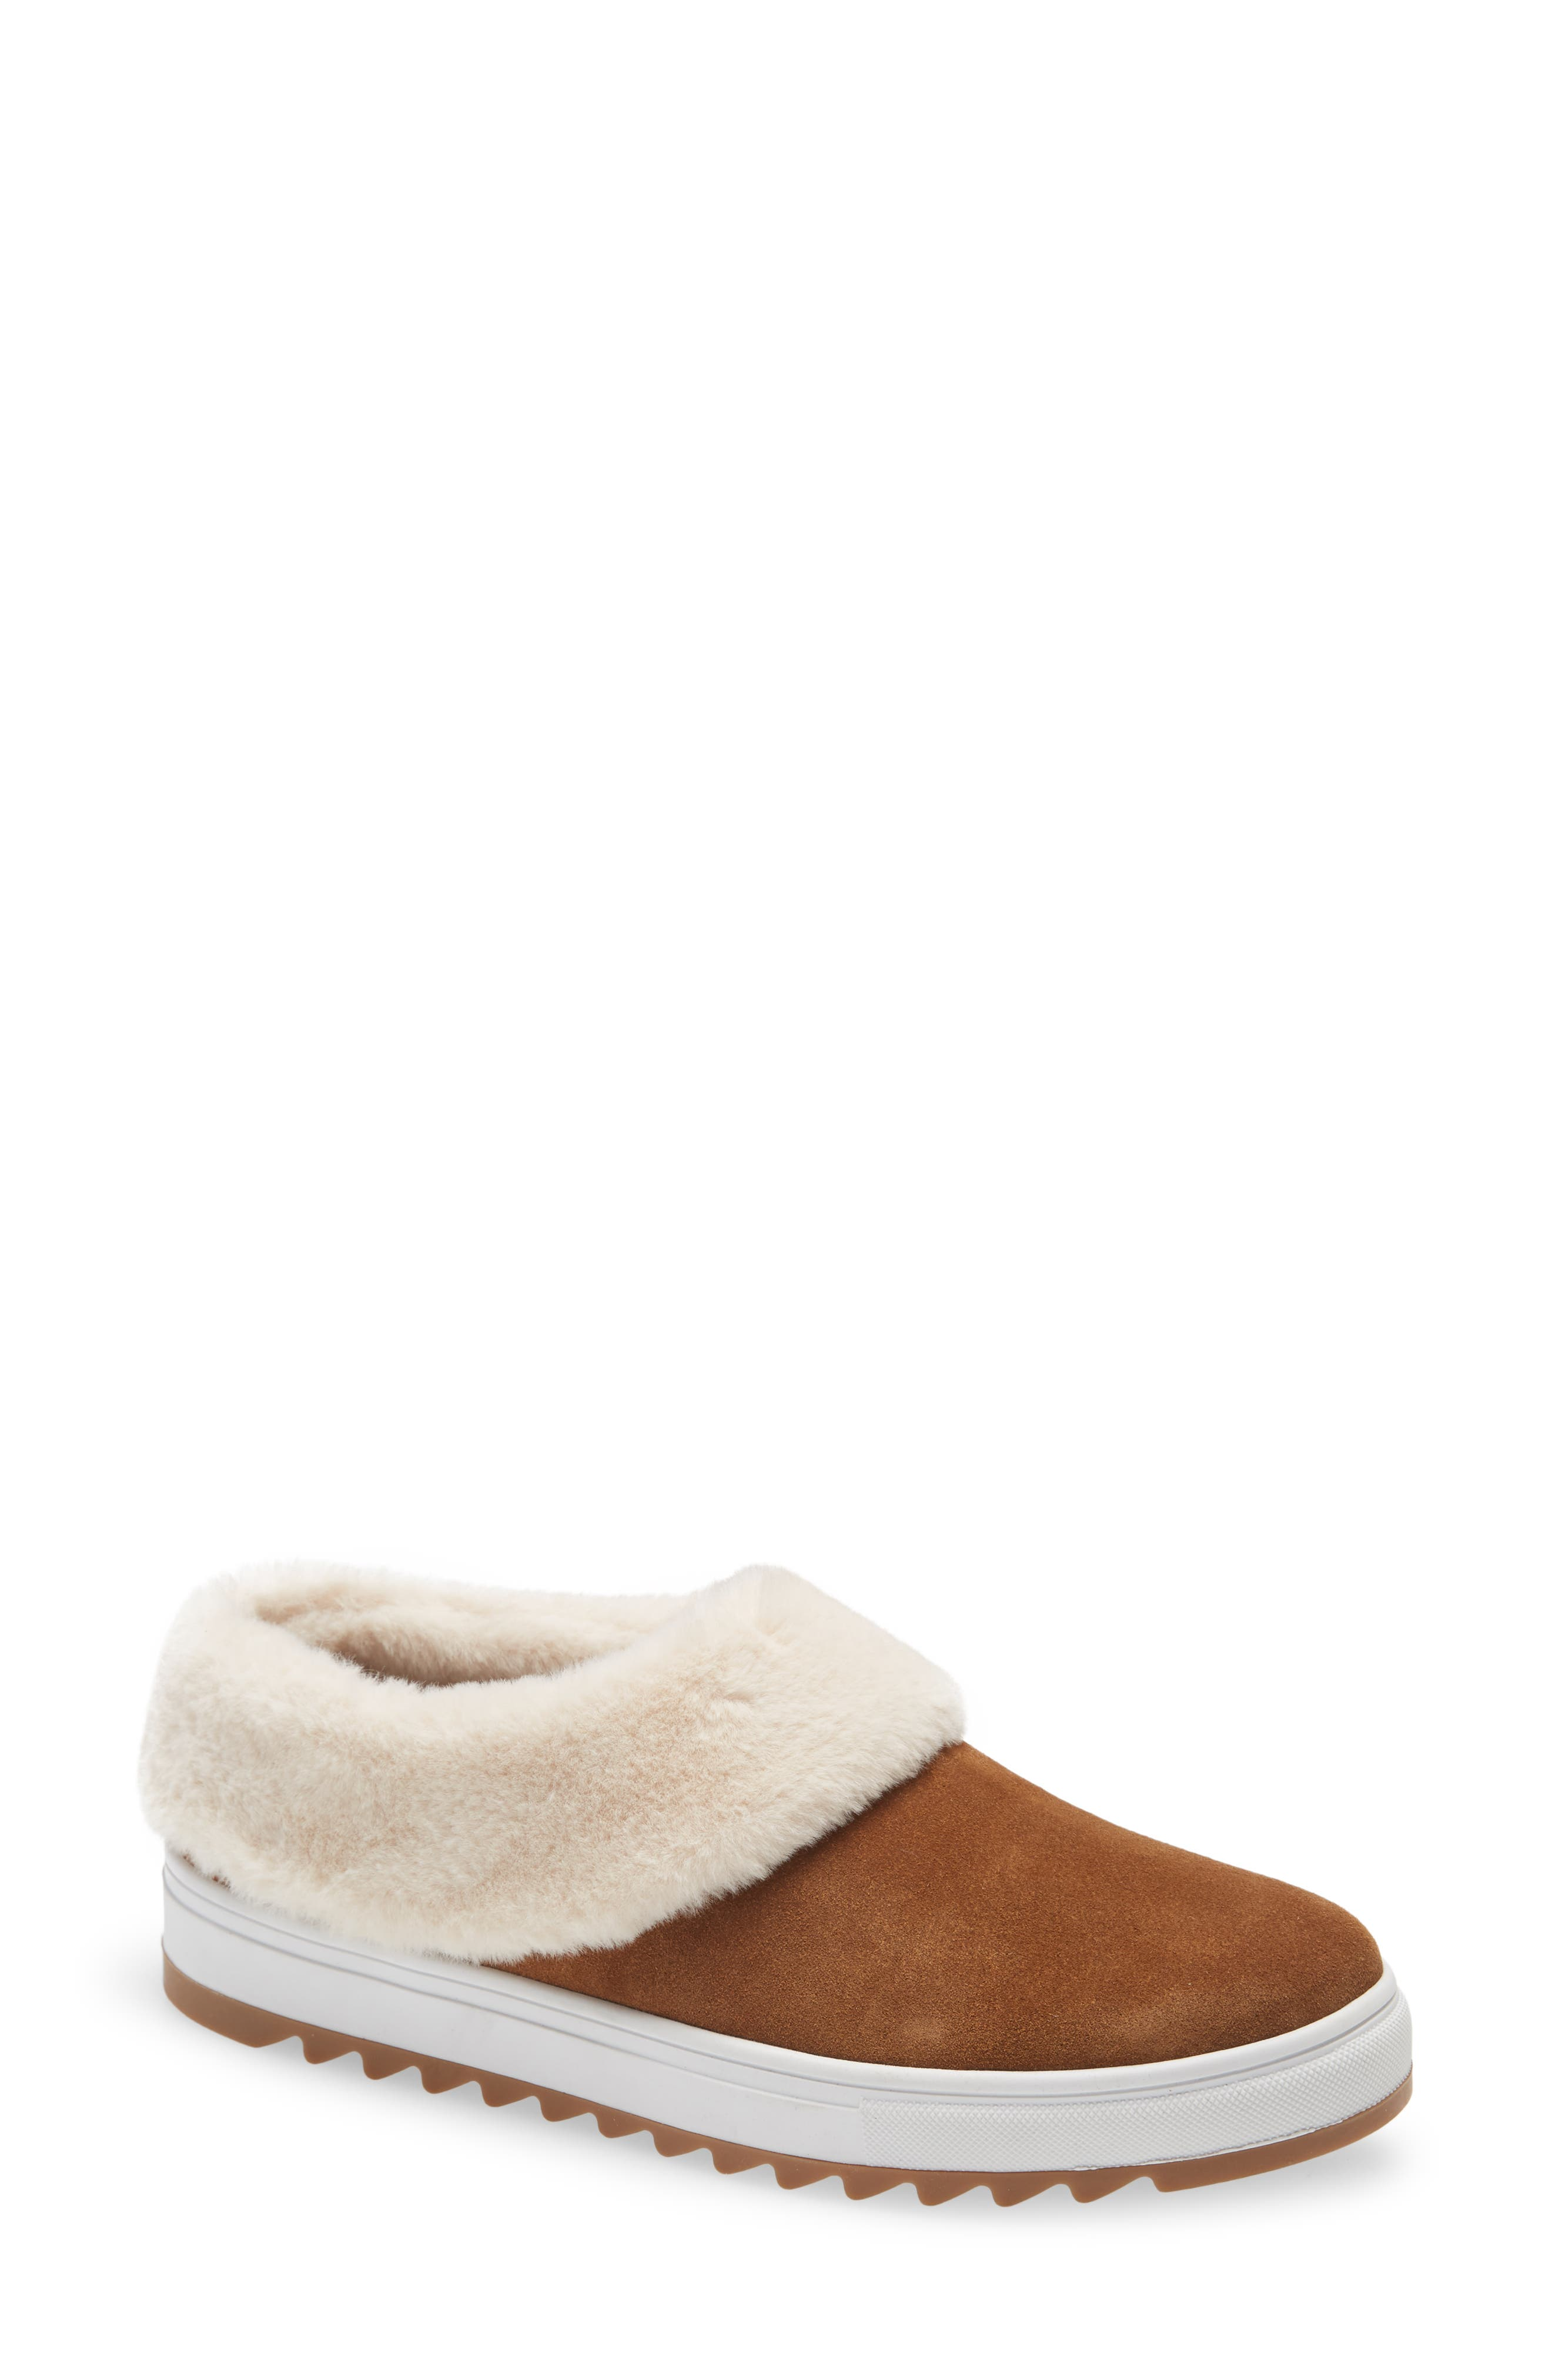 Suri Waterproof Slip-On Sneaker